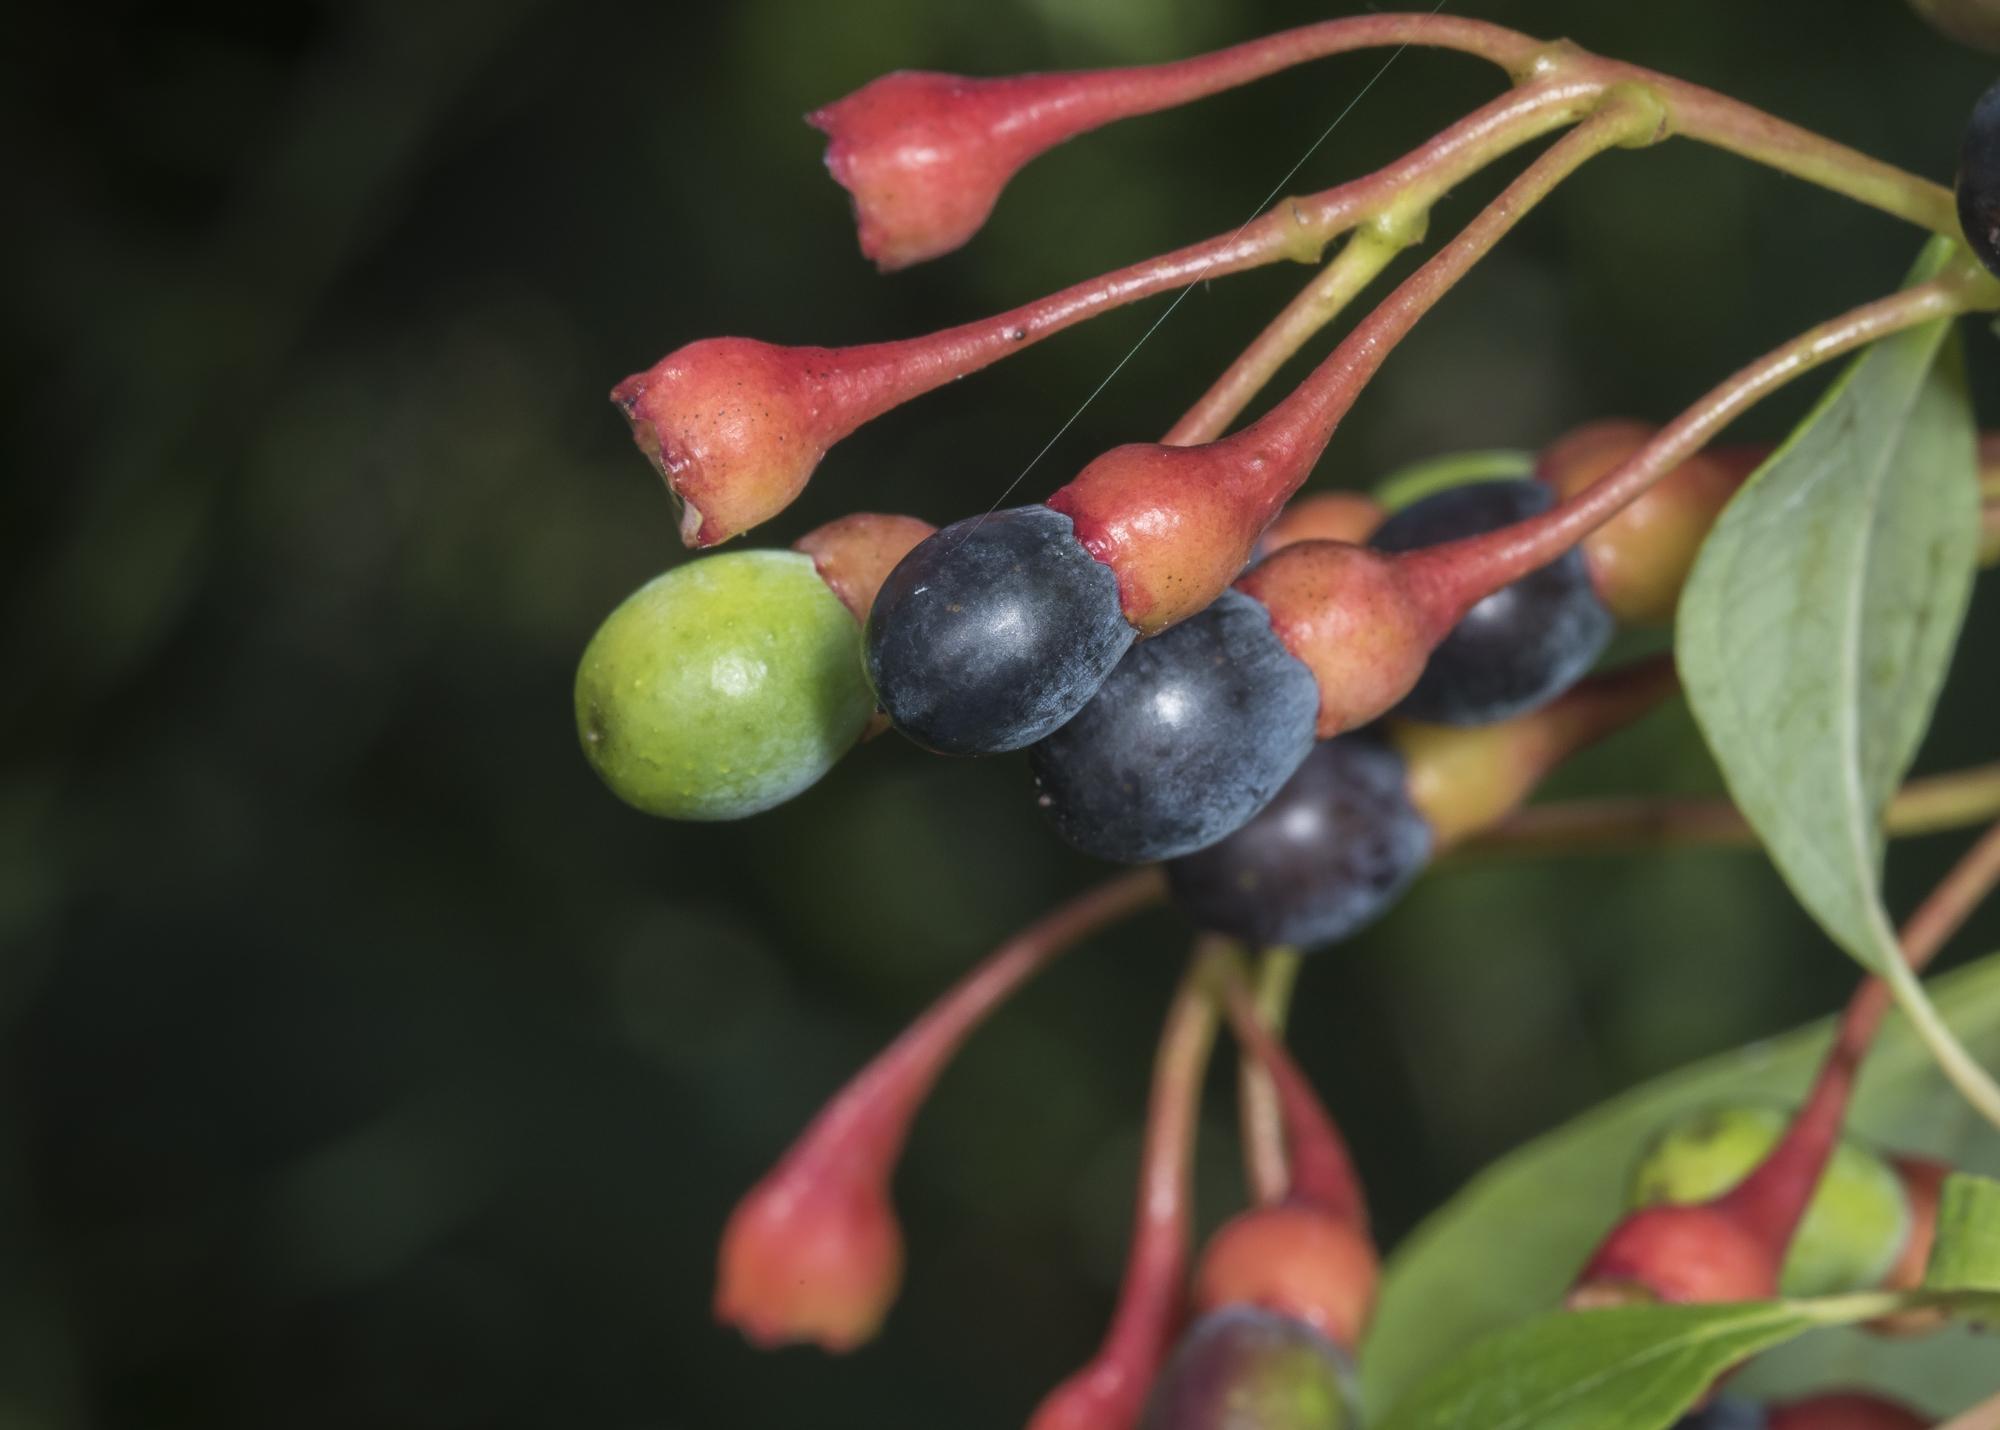 Sassafras berries